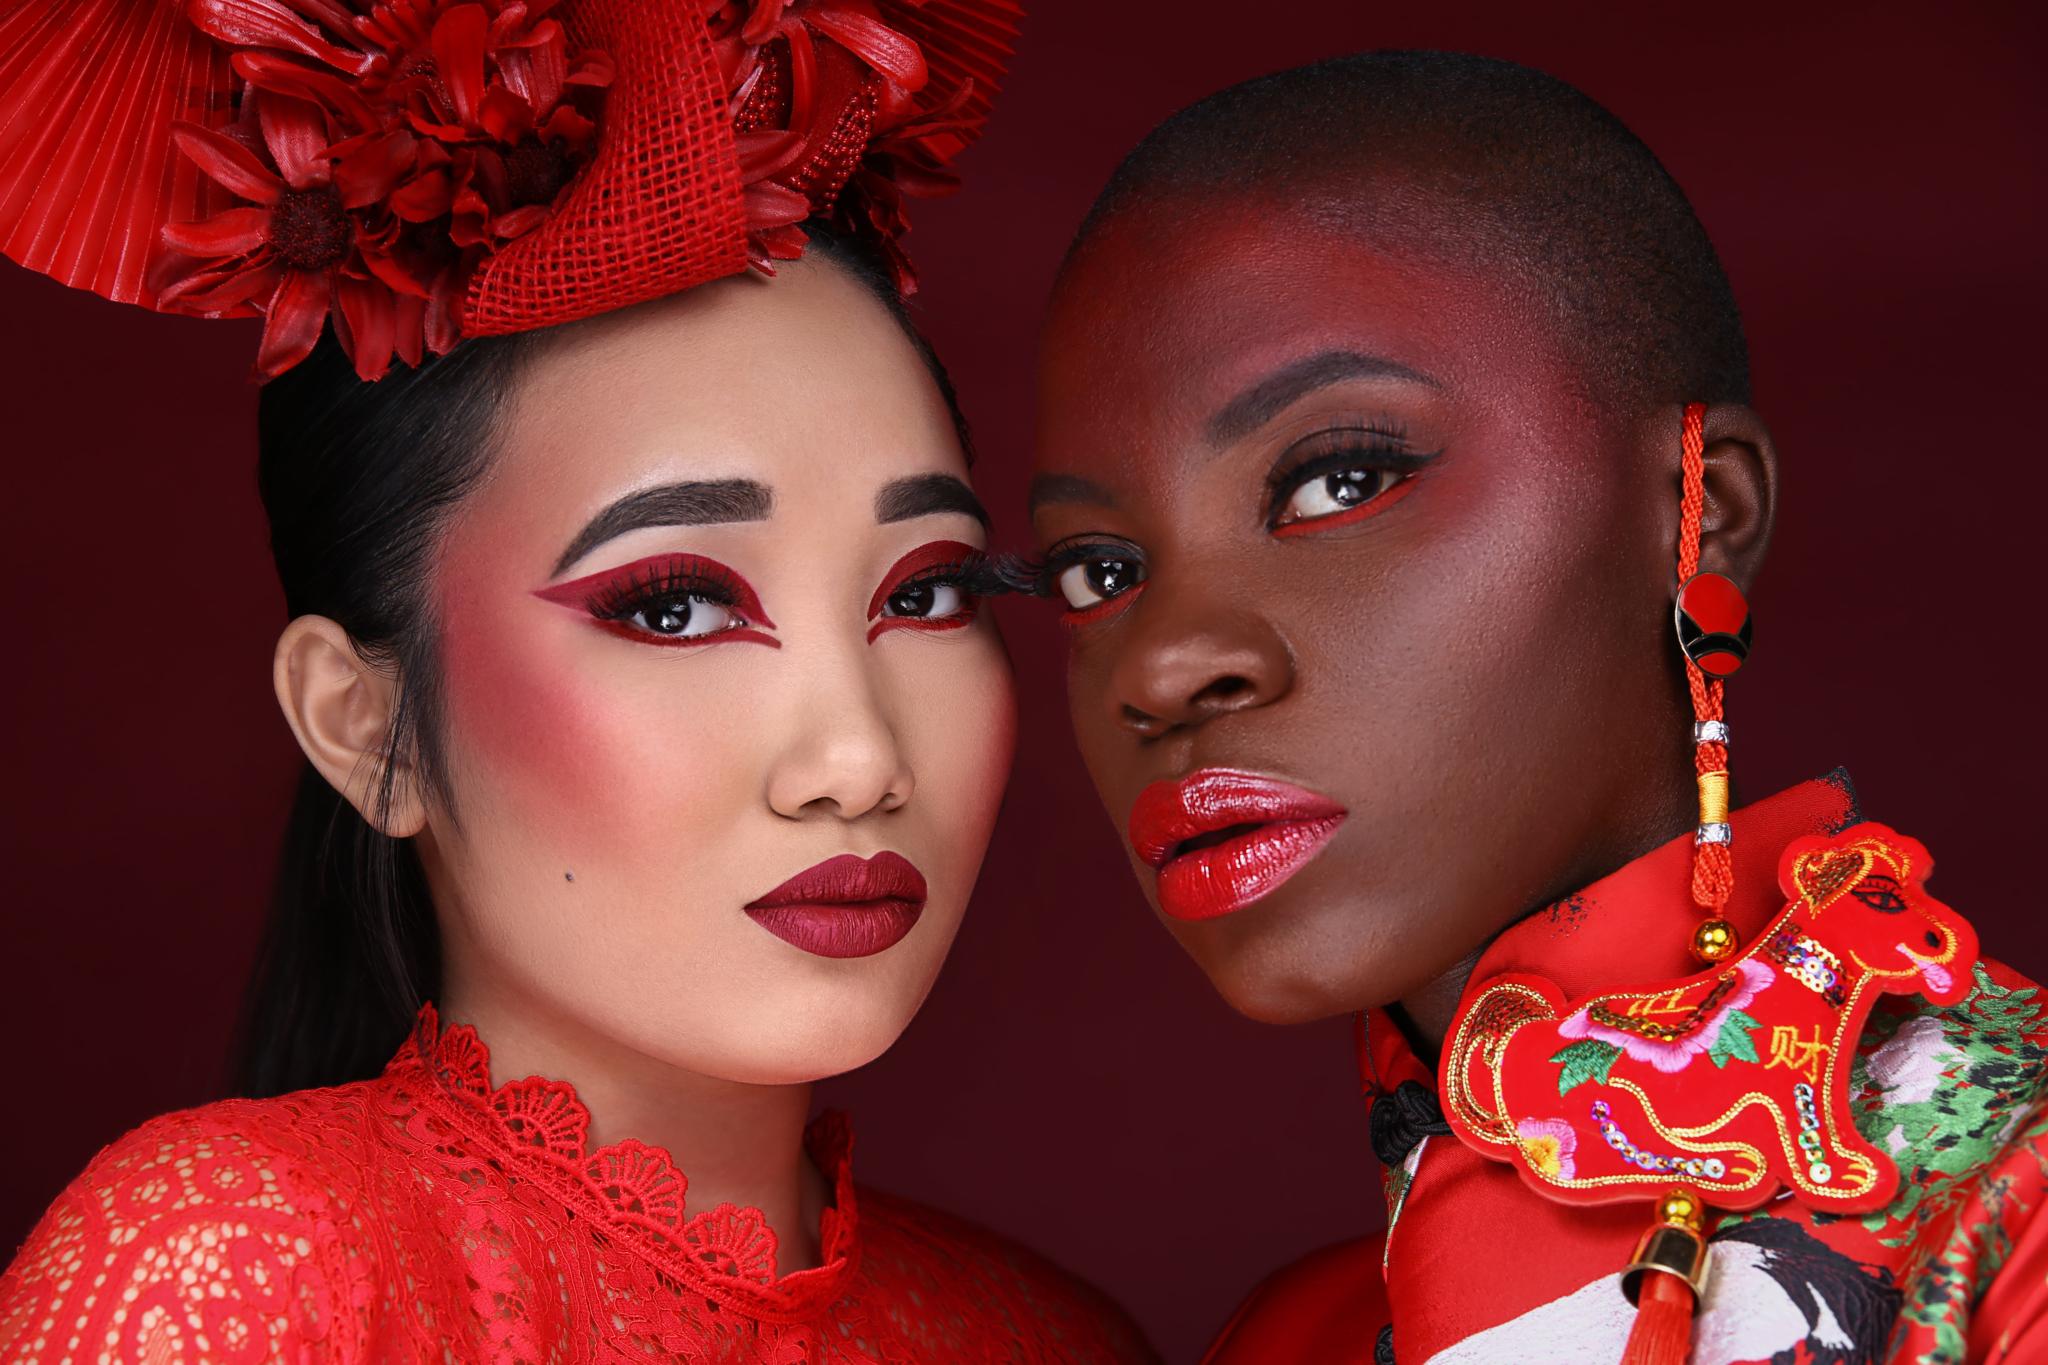 Lip Bar's Passport to Beauty